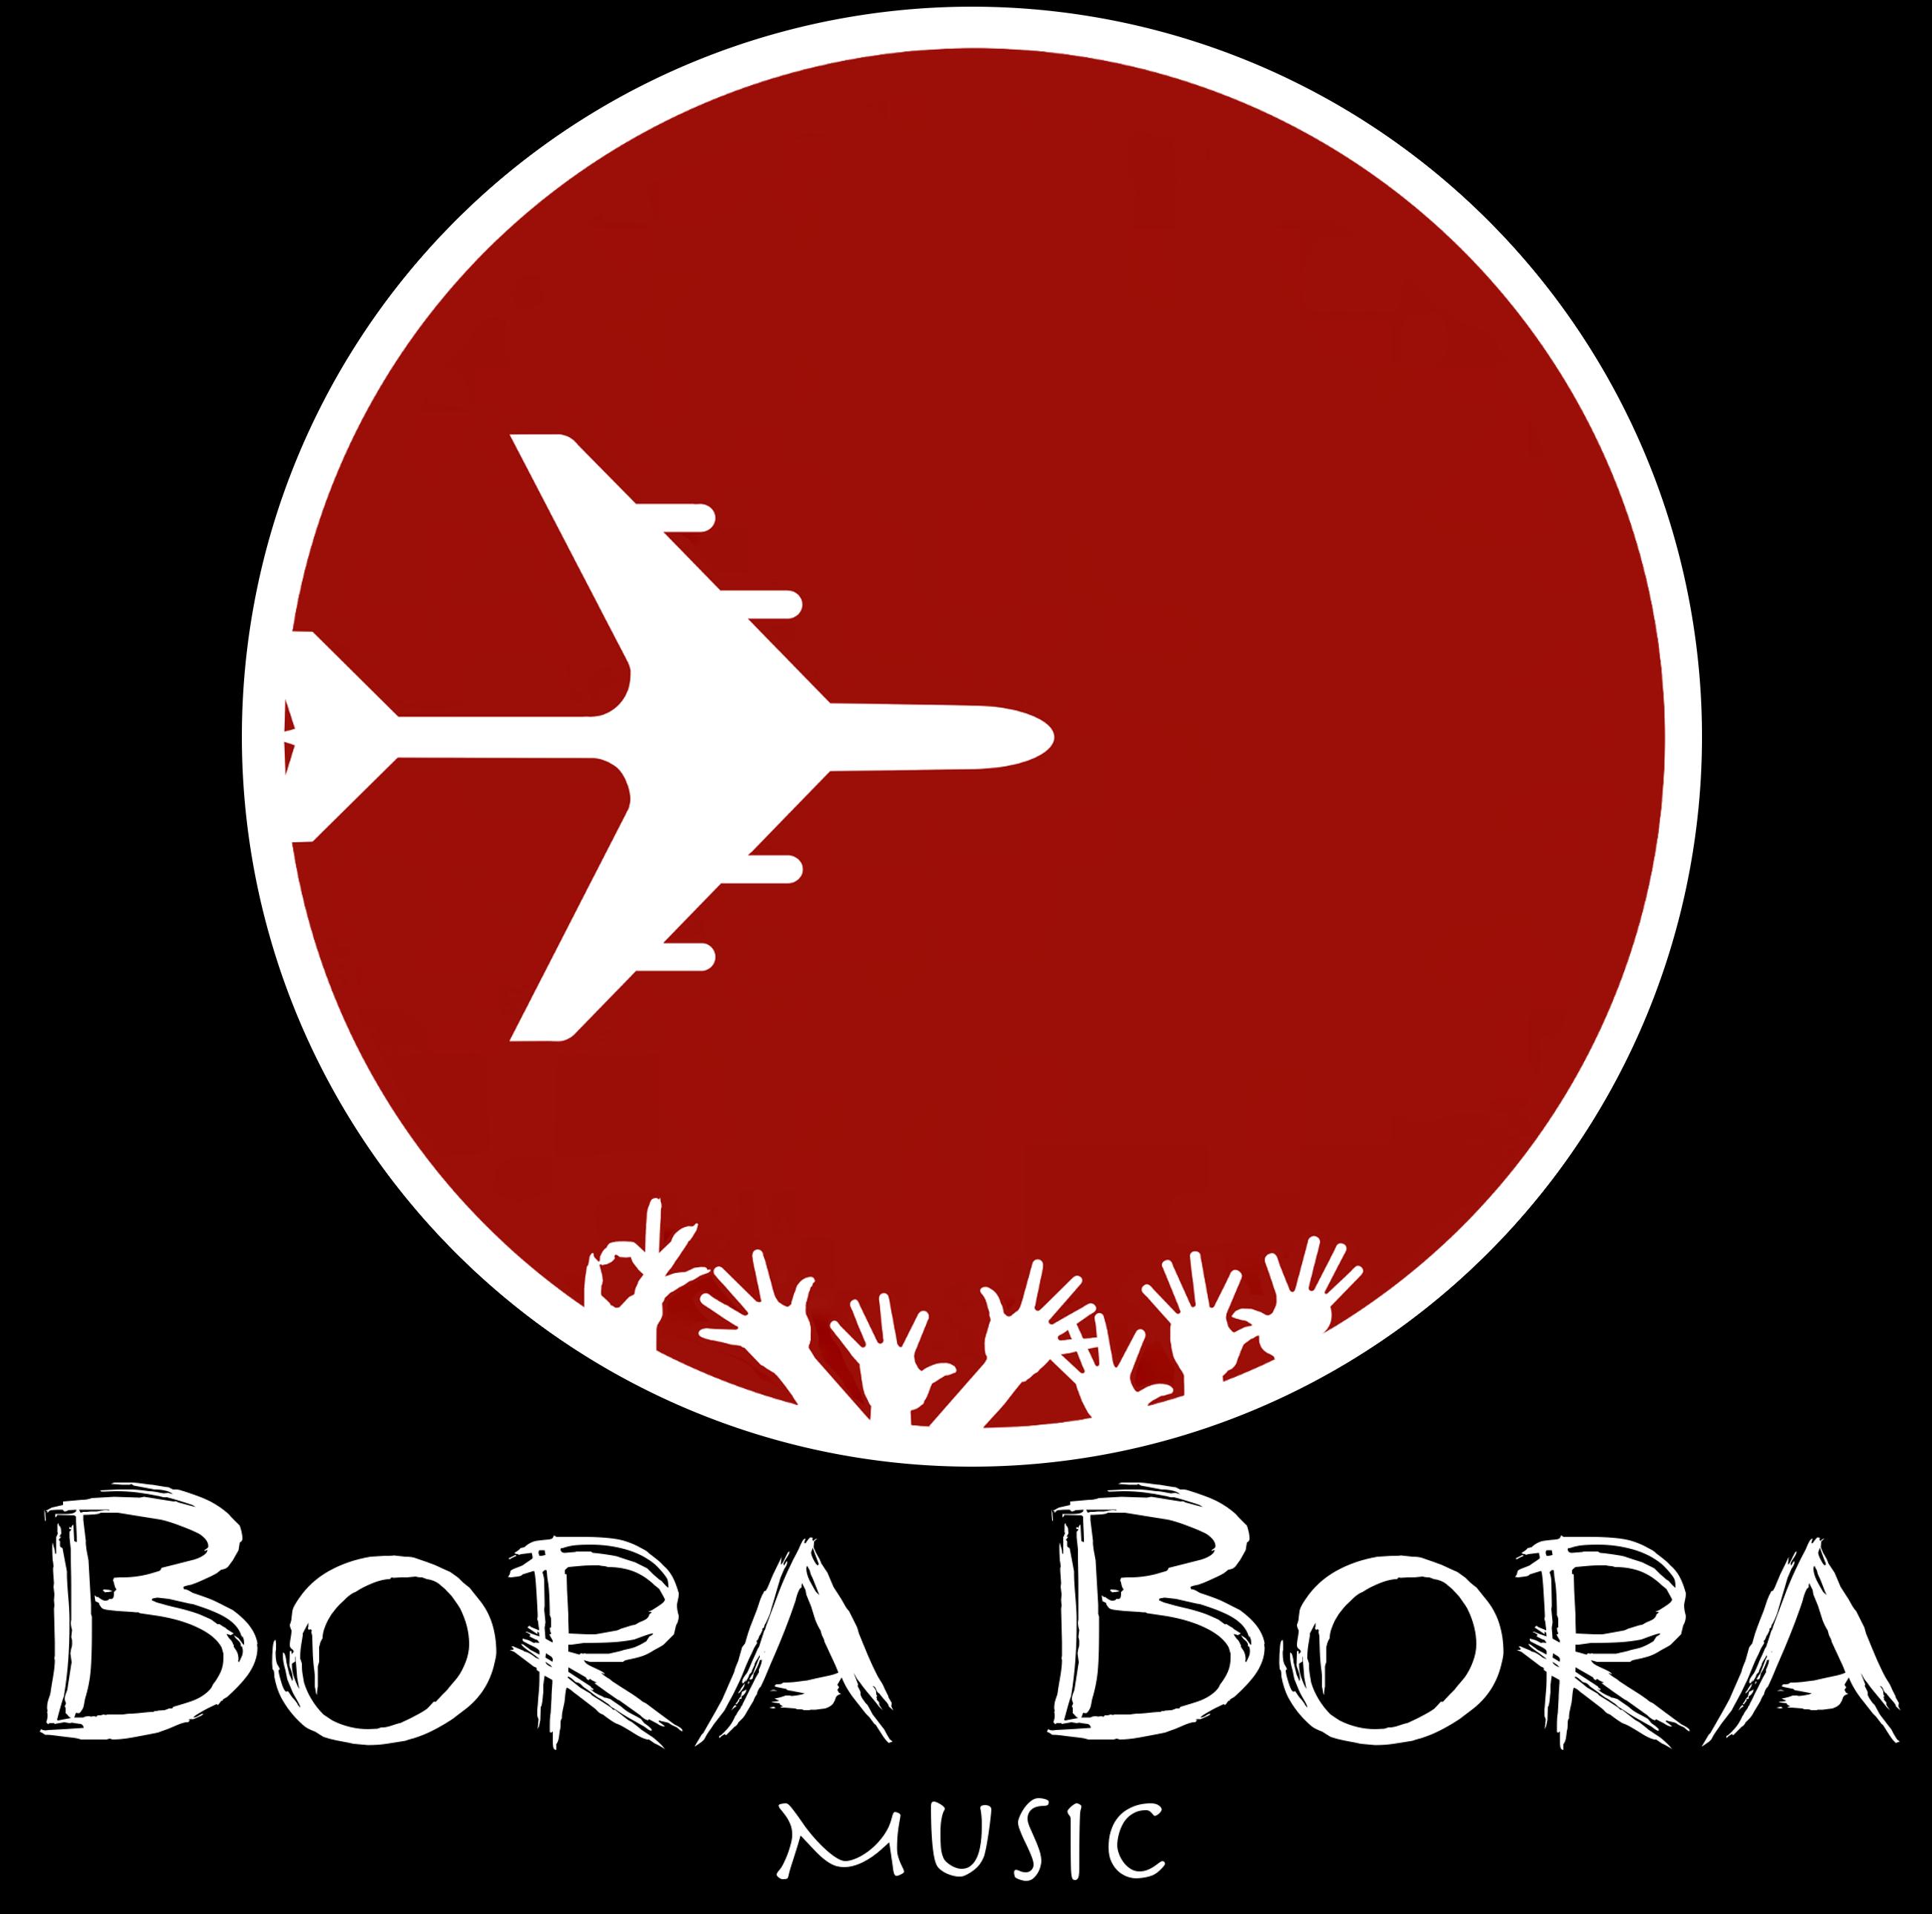 Bora Bora Music Original Black apparel